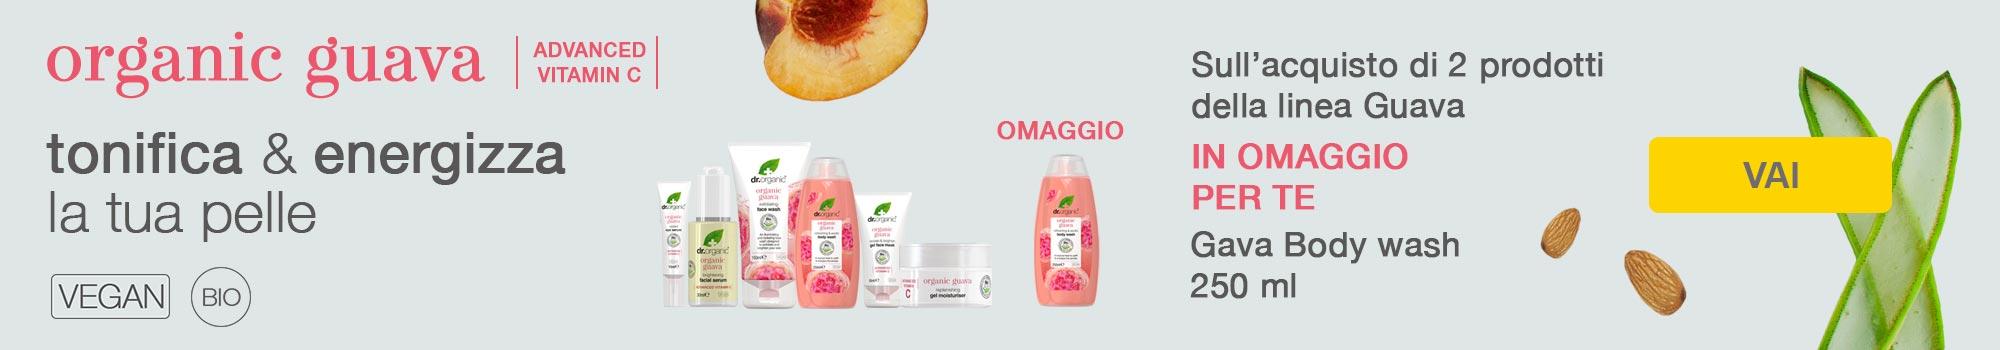 dr organic guava